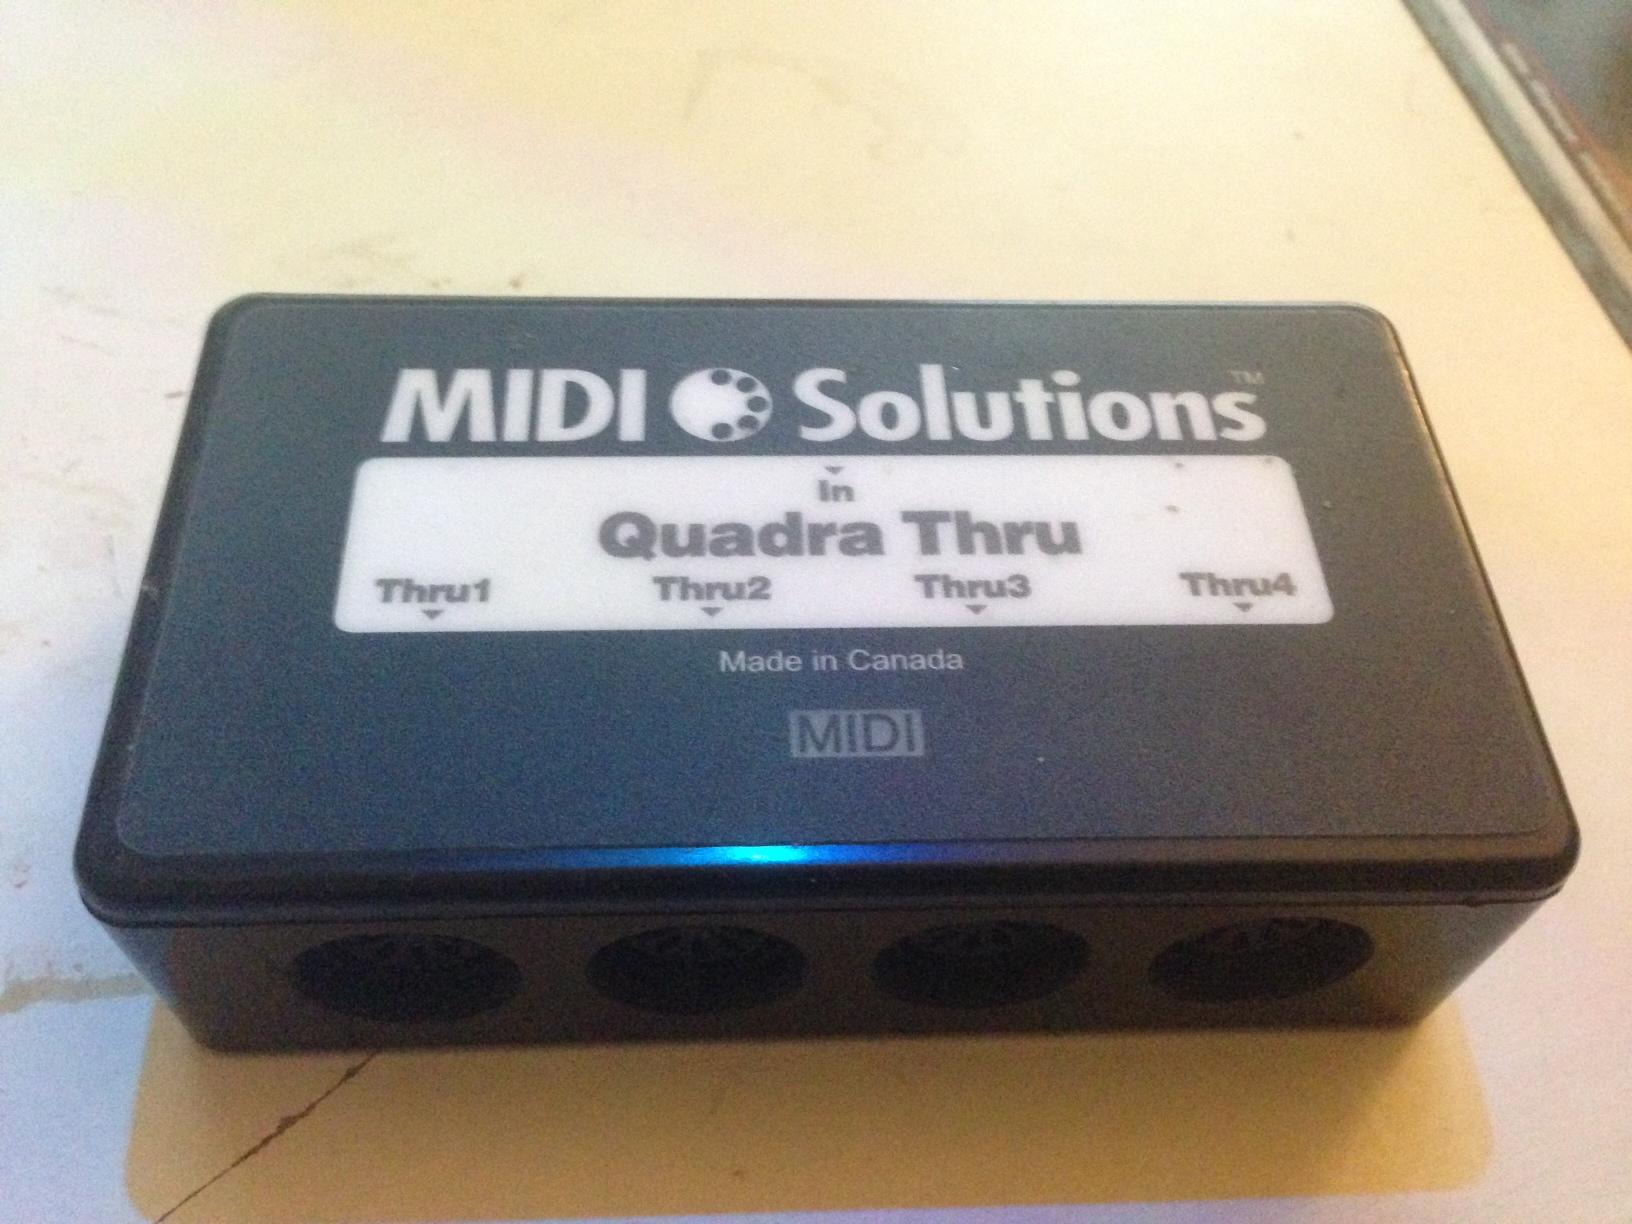 Midi Solutions Quadra Thru : photo midi solutions quadra thru midi solutions quadra thru 37012 821572 audiofanzine ~ Hamham.info Haus und Dekorationen